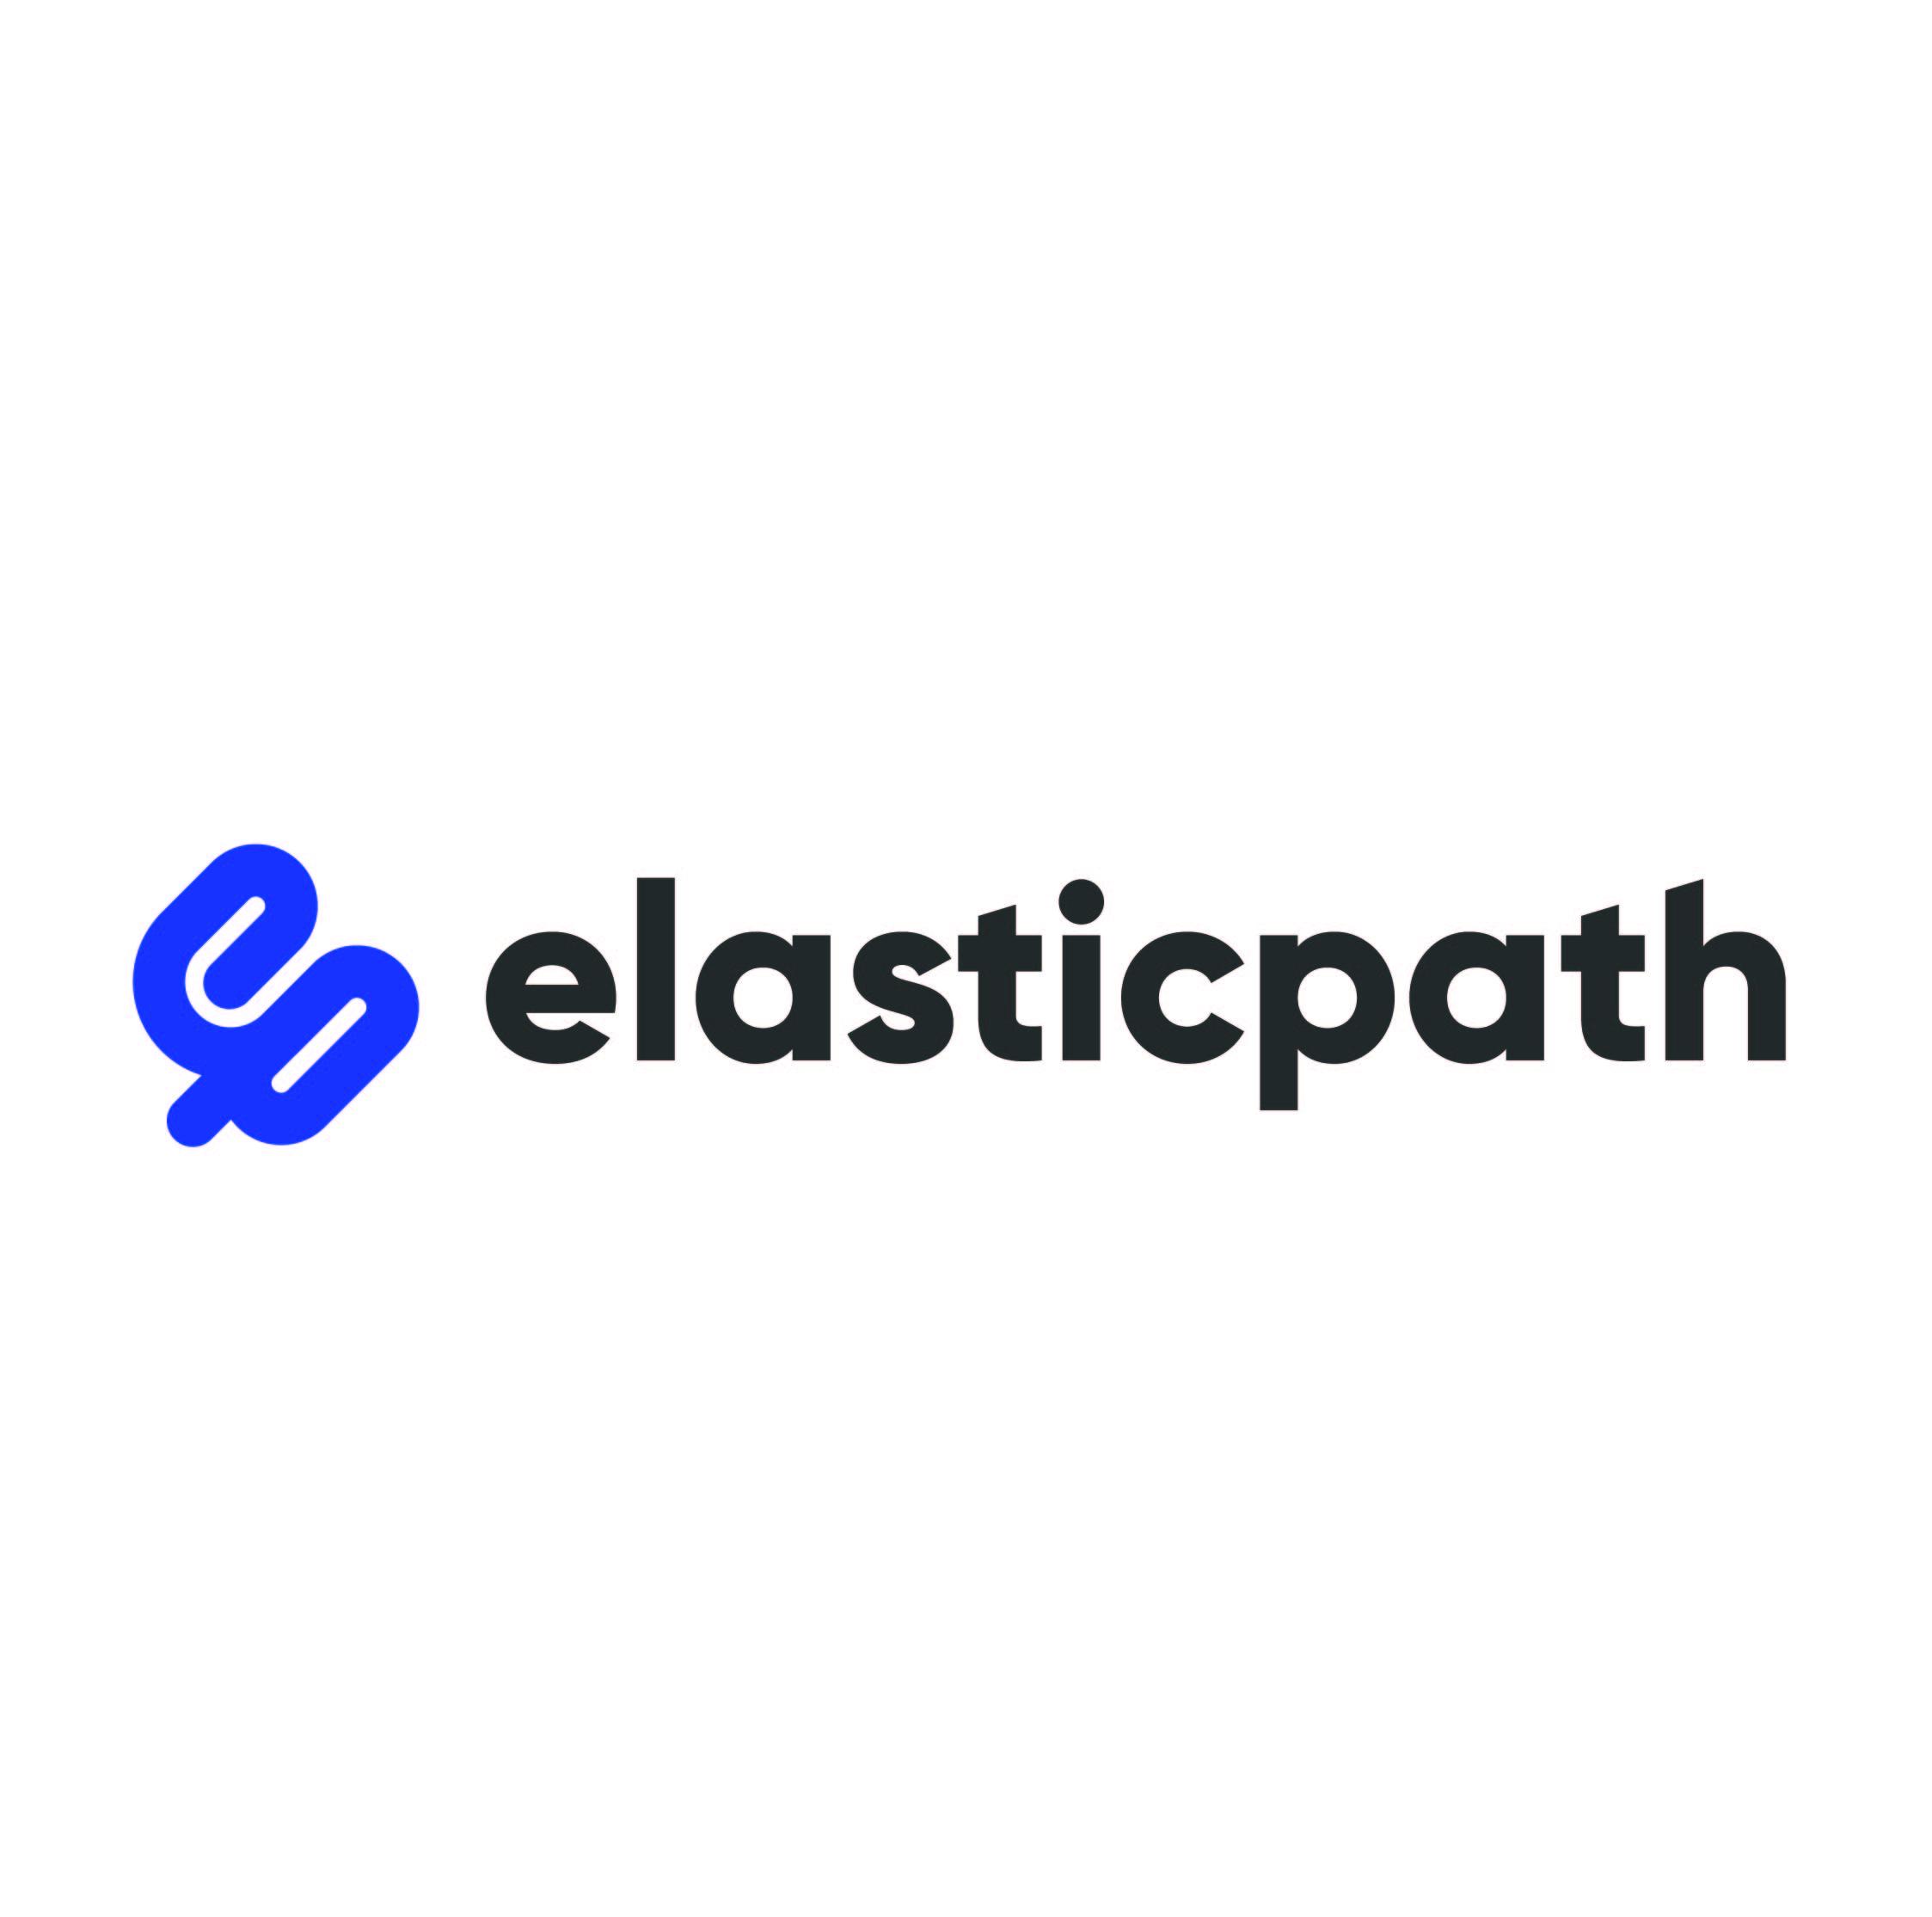 elasticpath.jpg